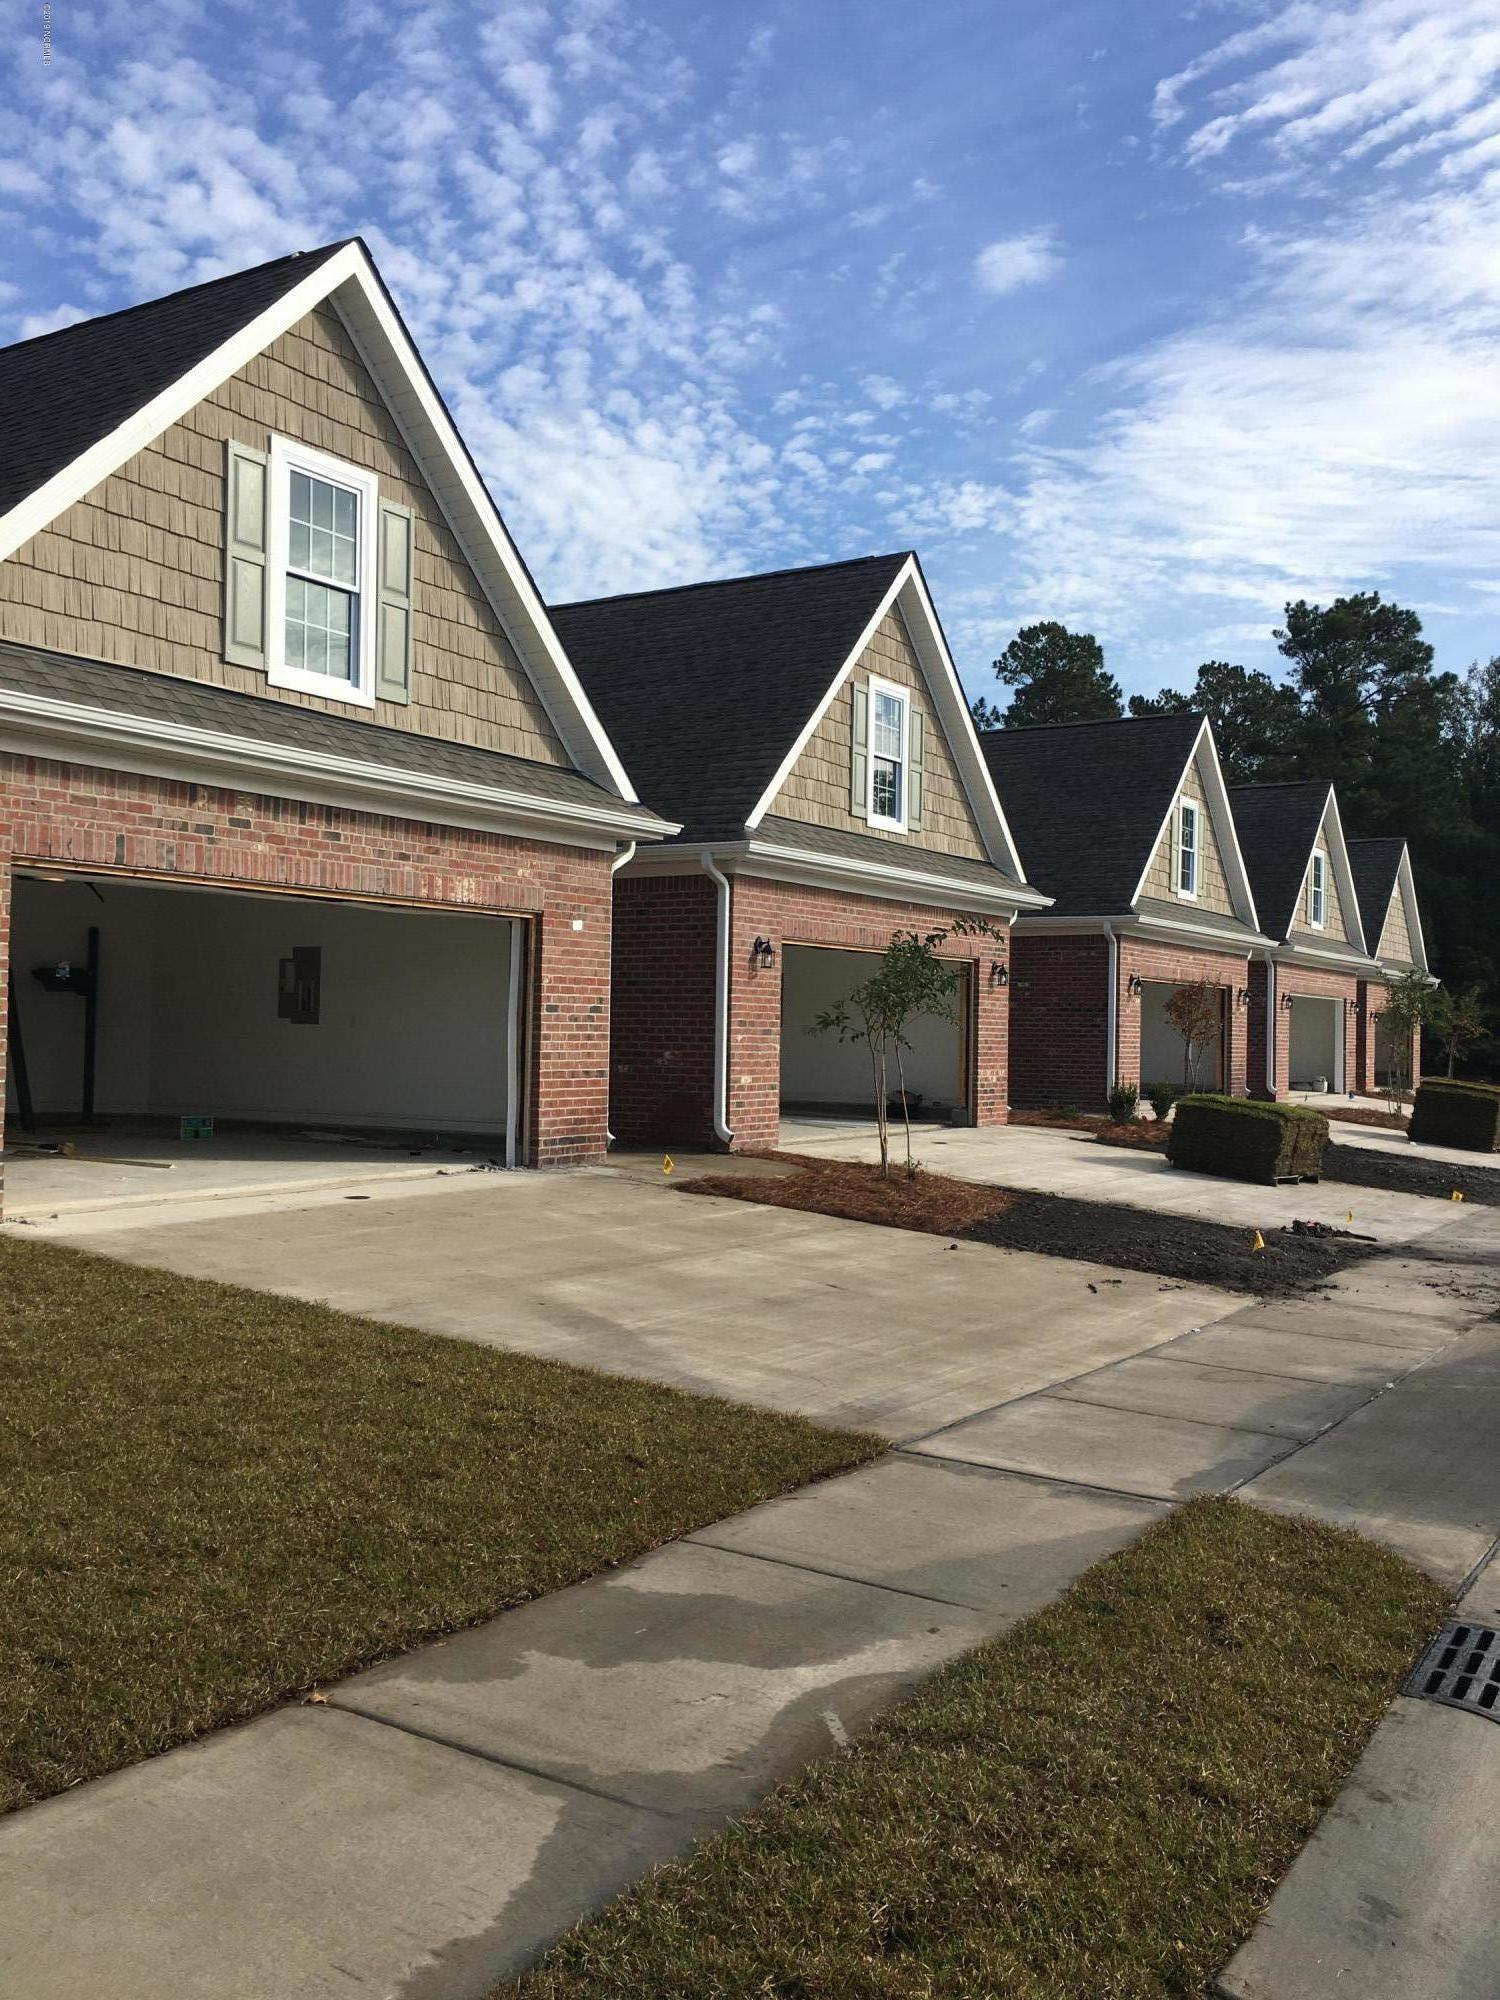 1267 Greensview Circle Leland, NC 28451